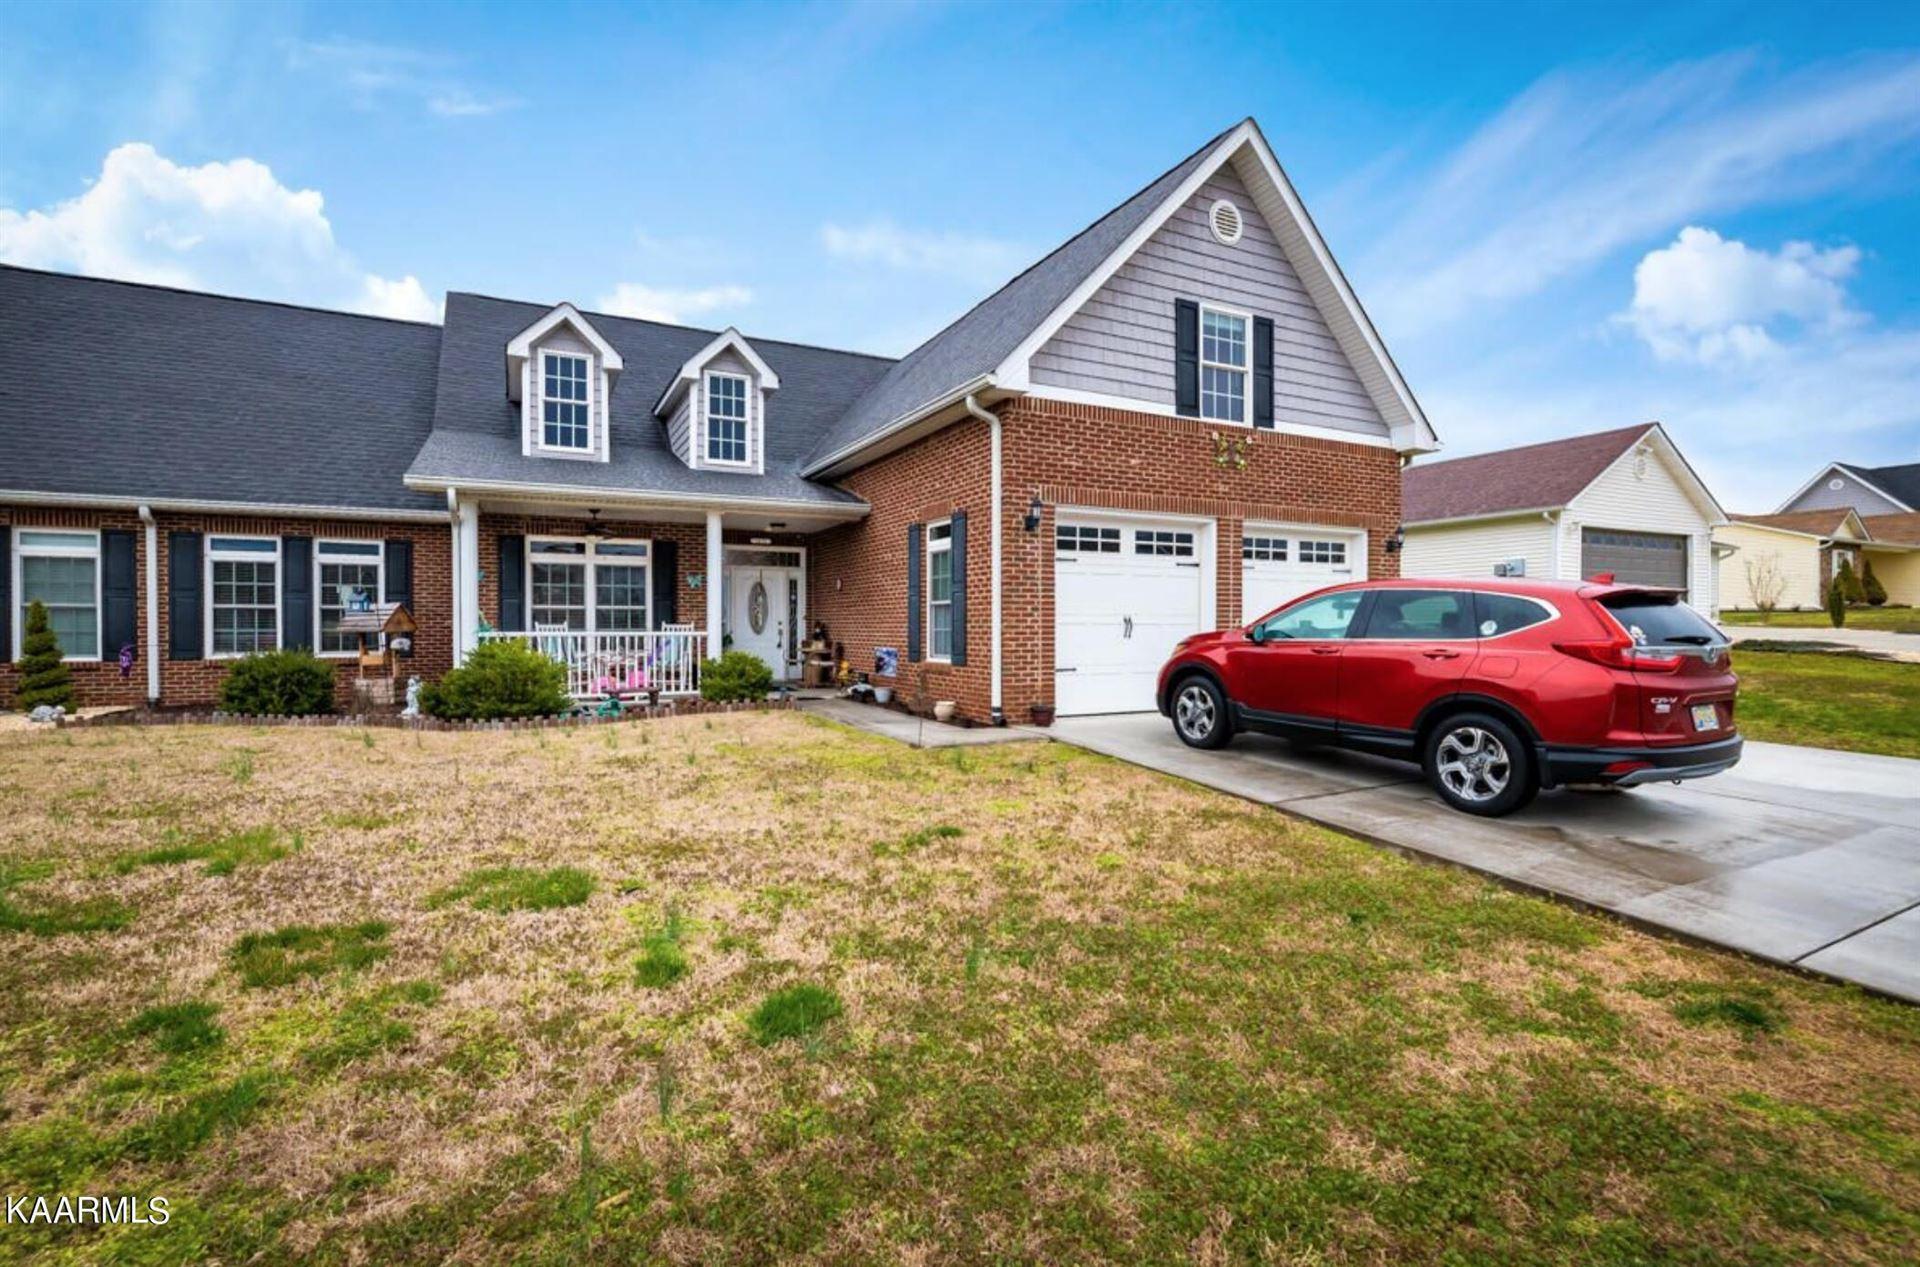 Photo of 1451 Avery Lane, Sevierville, TN 37862 (MLS # 1171559)